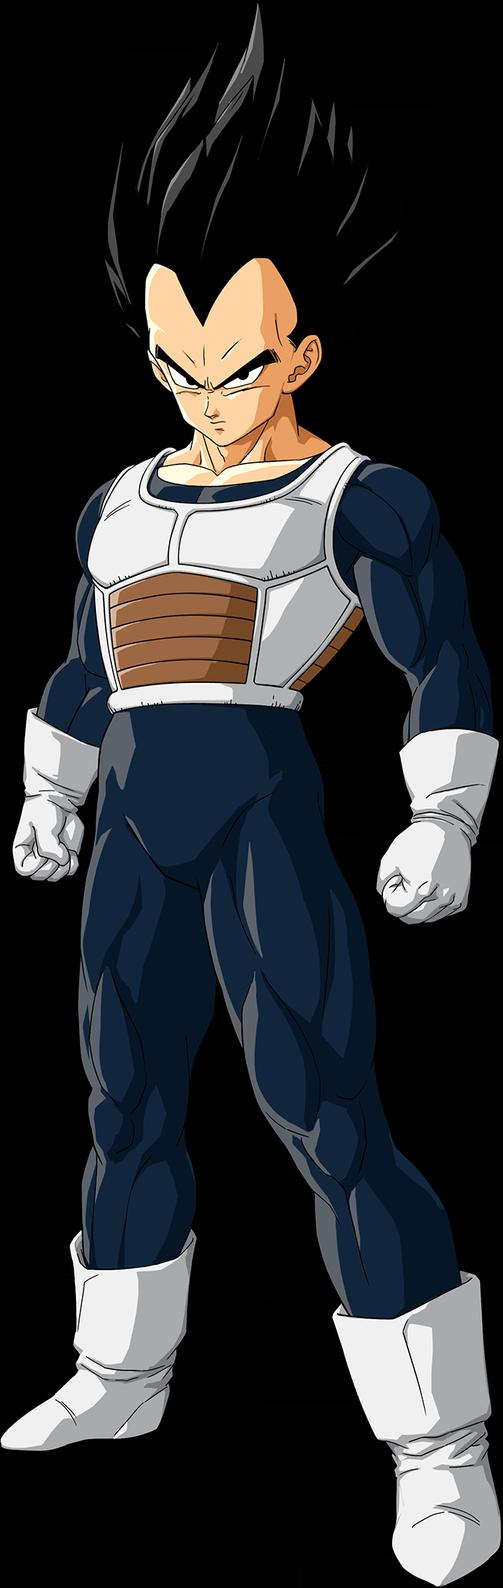 Vegeta Namek Render Dbz Kakarot By Maxiuchiha22 On Deviantart Anime Dragon Ball Super Dragon Ball Image Dragon Ball Super Goku